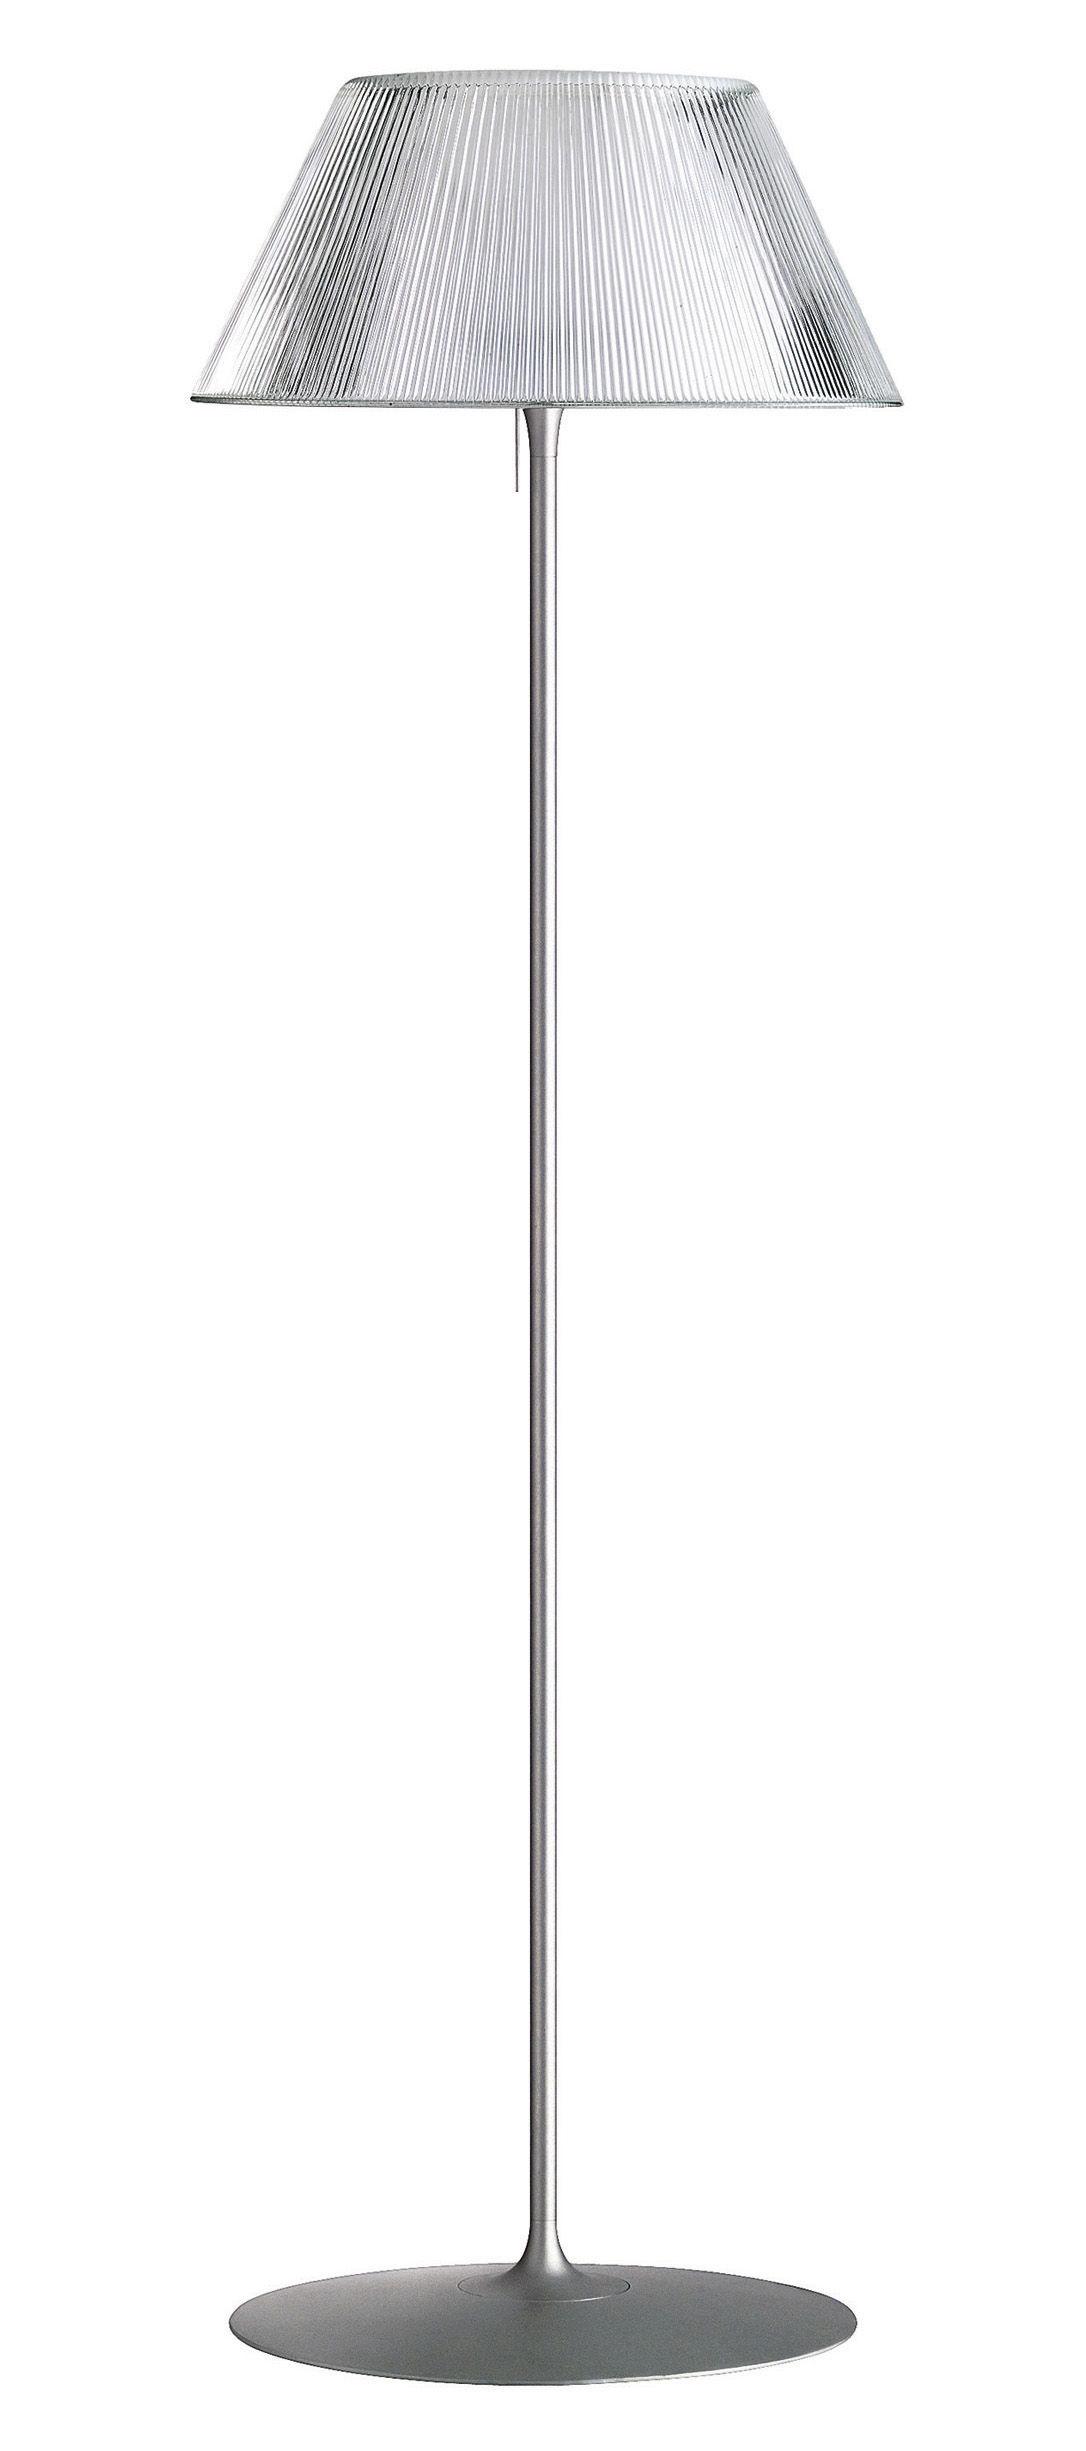 Lighting - Floor lamps - Romeo Moon F Floor lamp by Flos - Grey - Glass, Metal